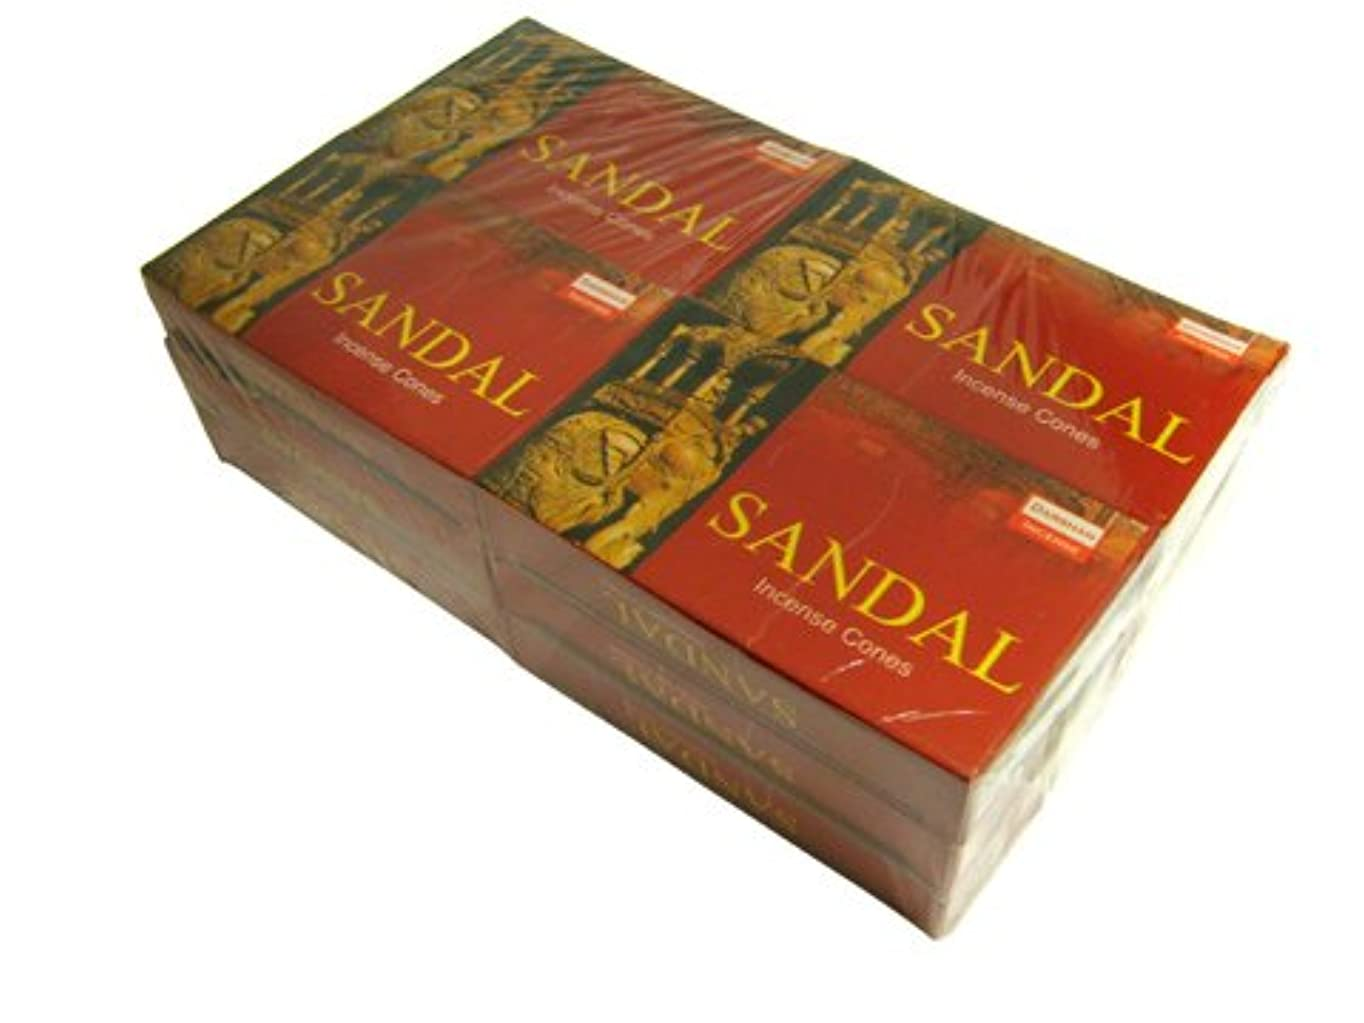 DARSHAN(ダルシャン) サンダル香 コーンタイプ SANDAL CORN 12箱セット